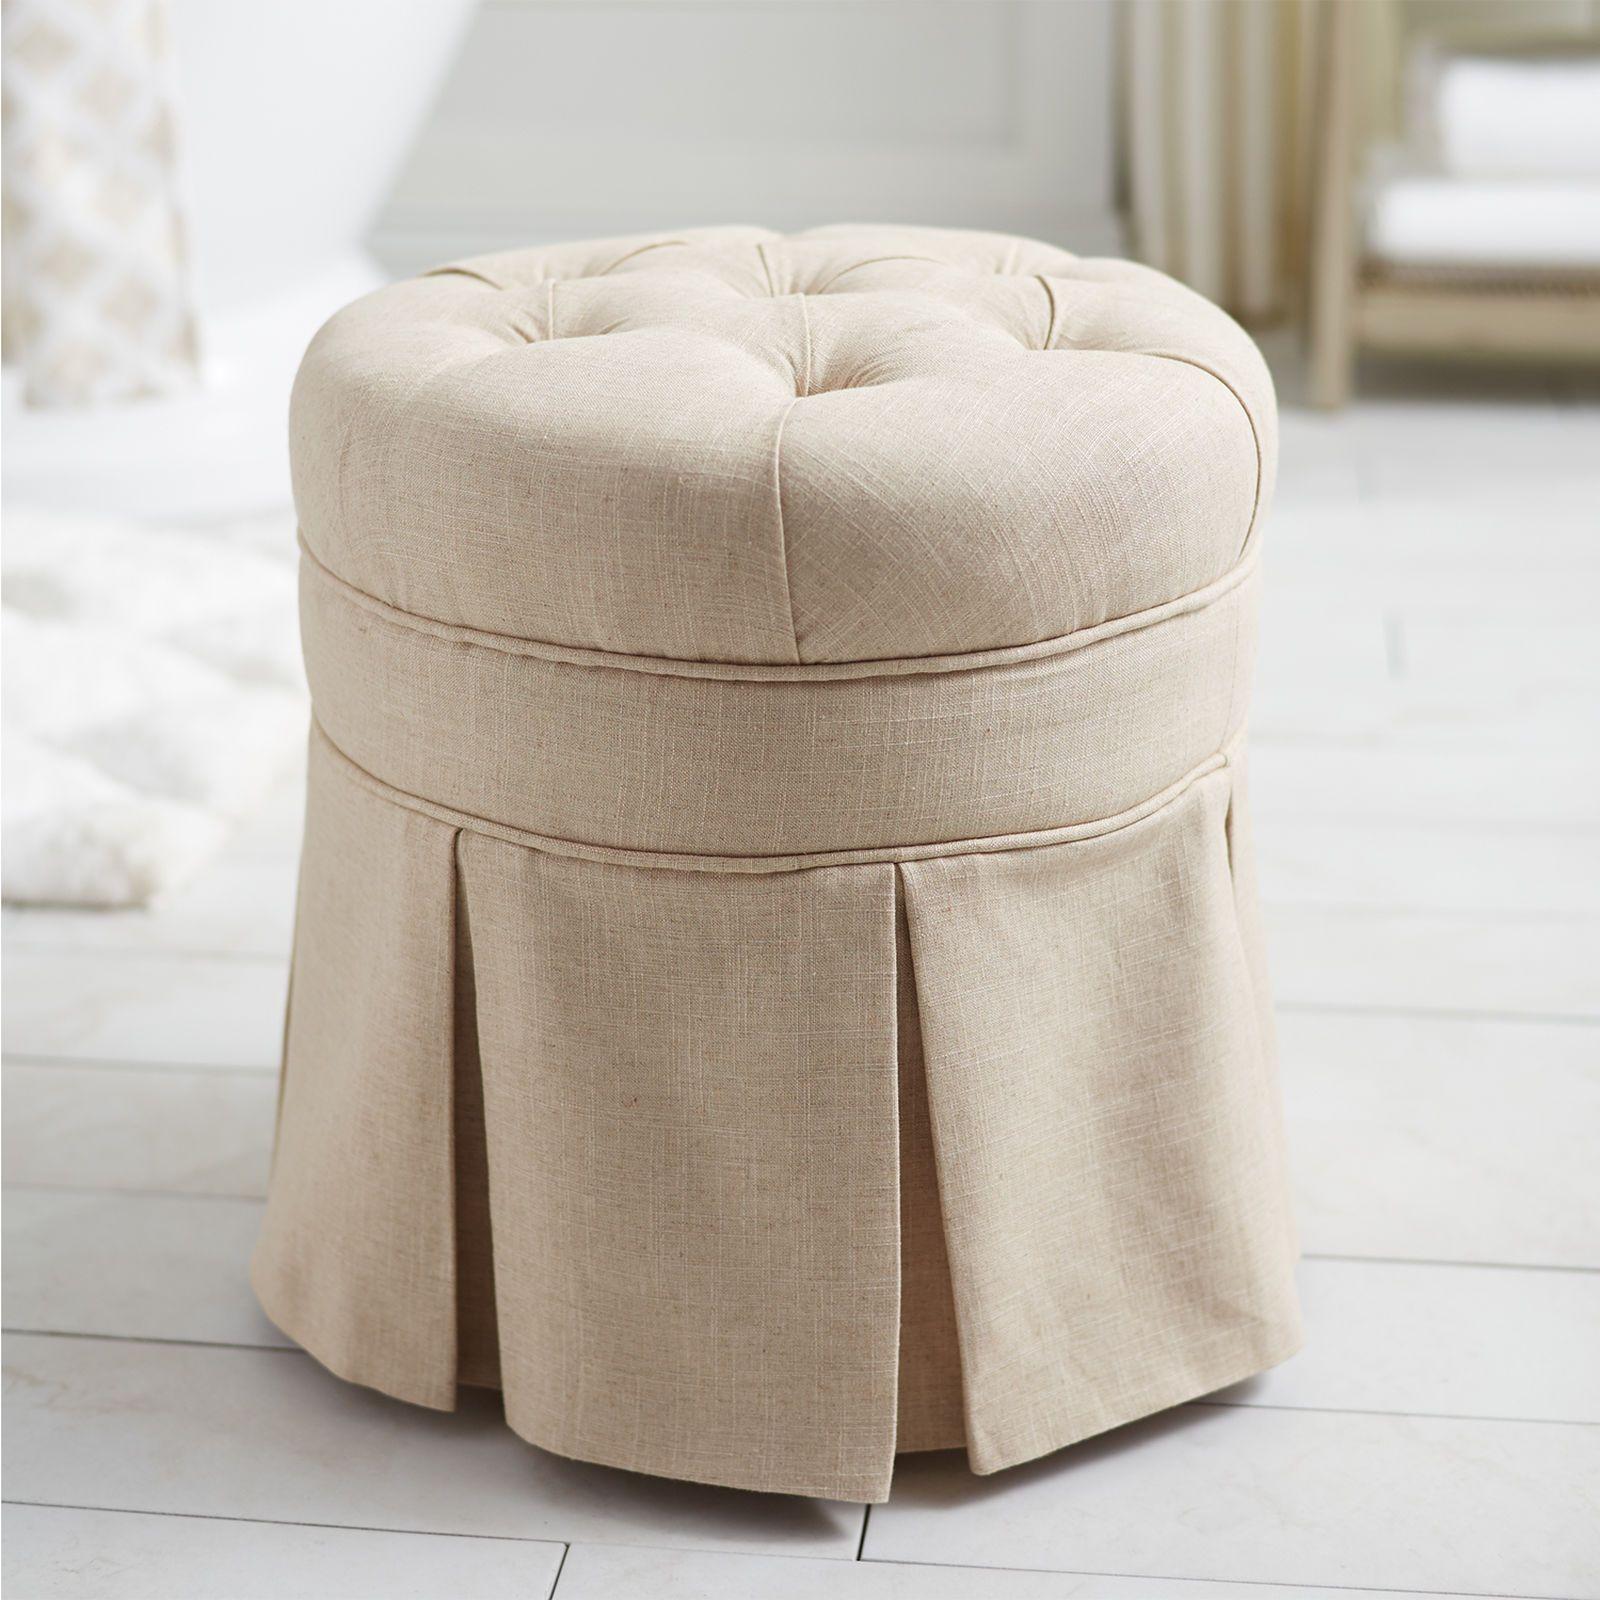 Avery Vanity Stool | Sound design, Vanity stool and Construction